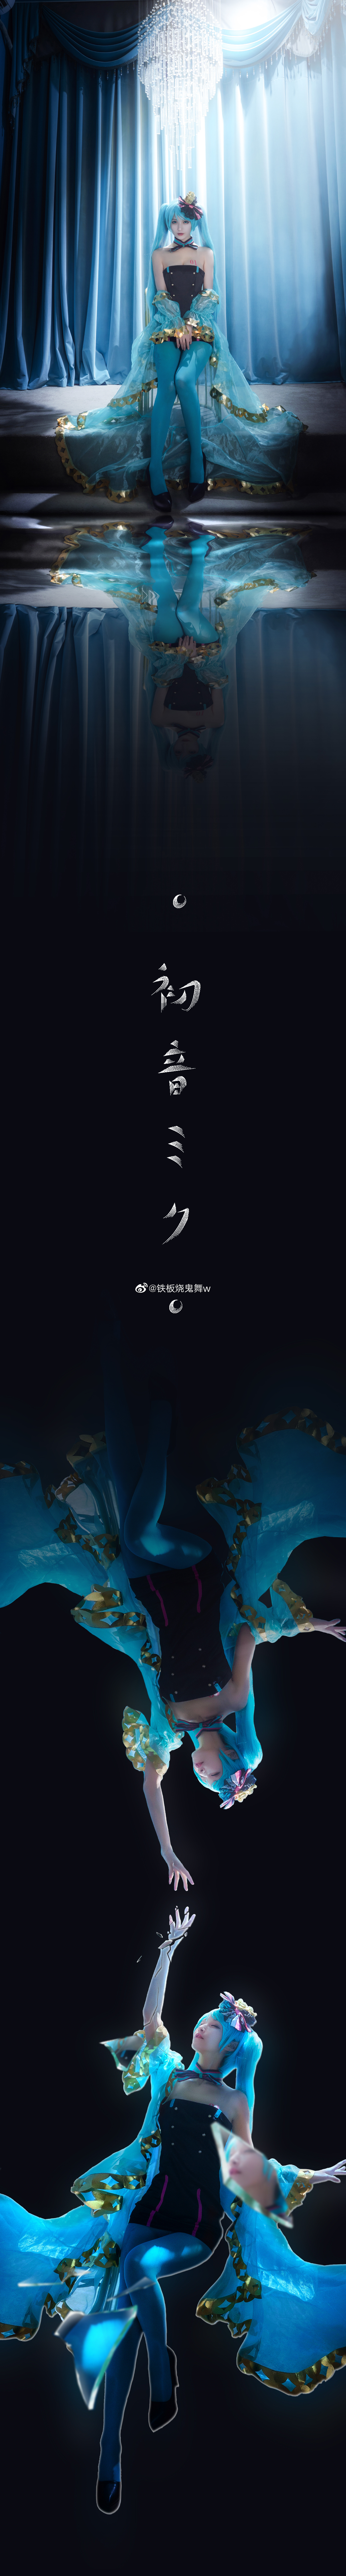 [COS]初音miku 初音未来 @铁板烧鬼舞w COSPLAY-第1张